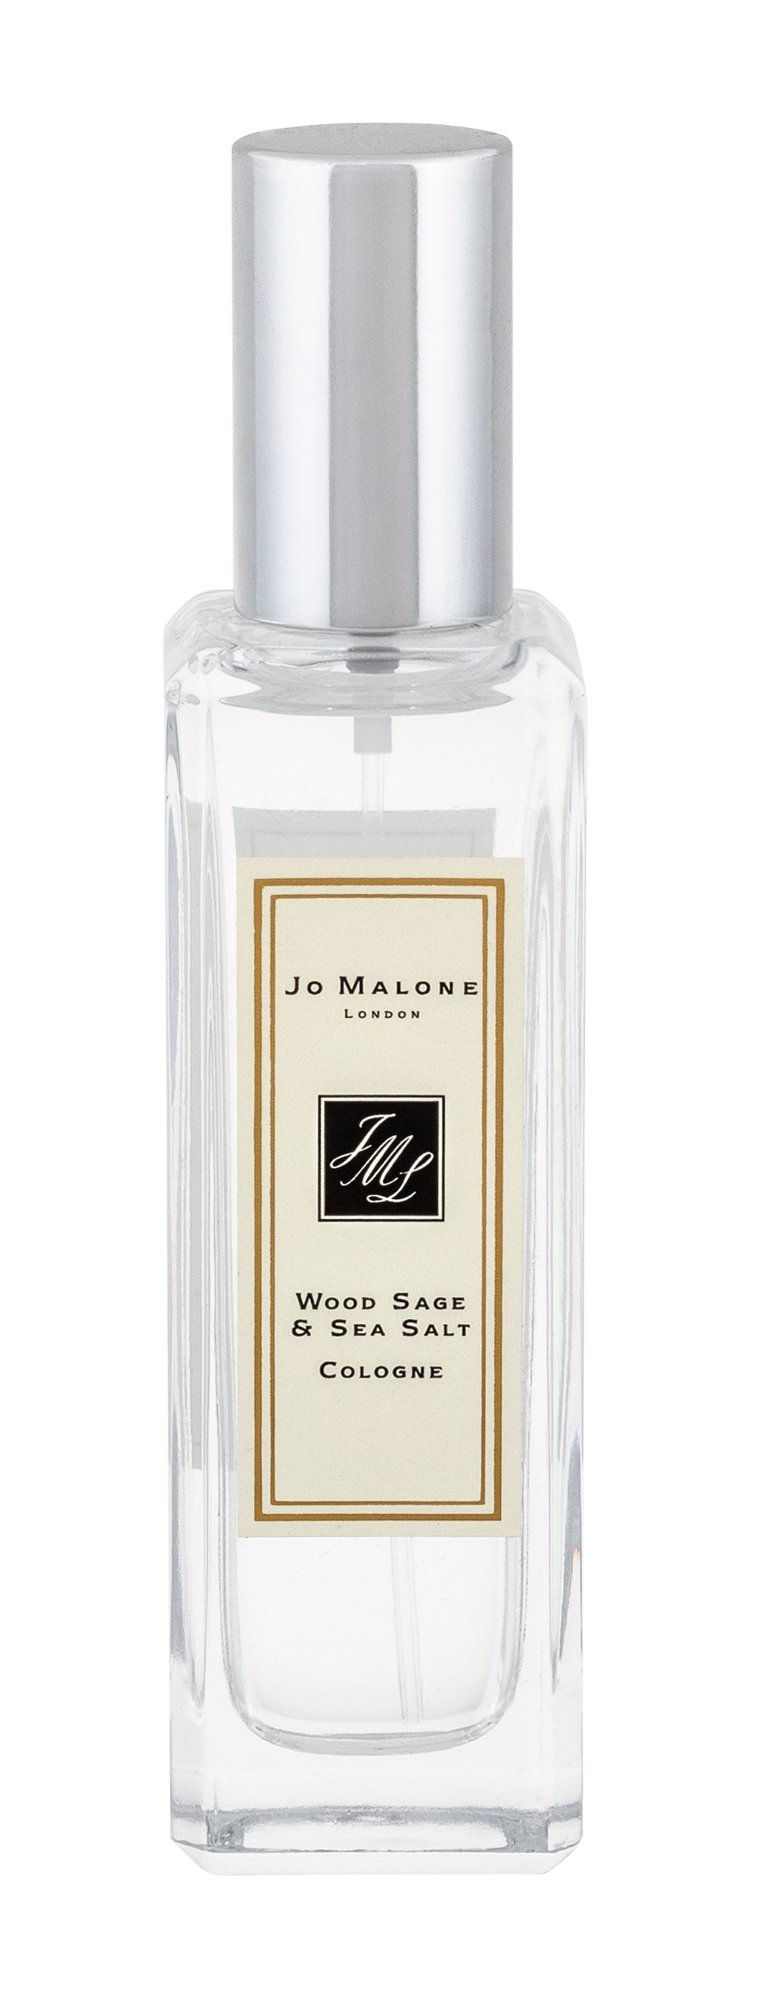 Jo Malone Wood Sage & Sea Salt, edc 100ml - Teszter